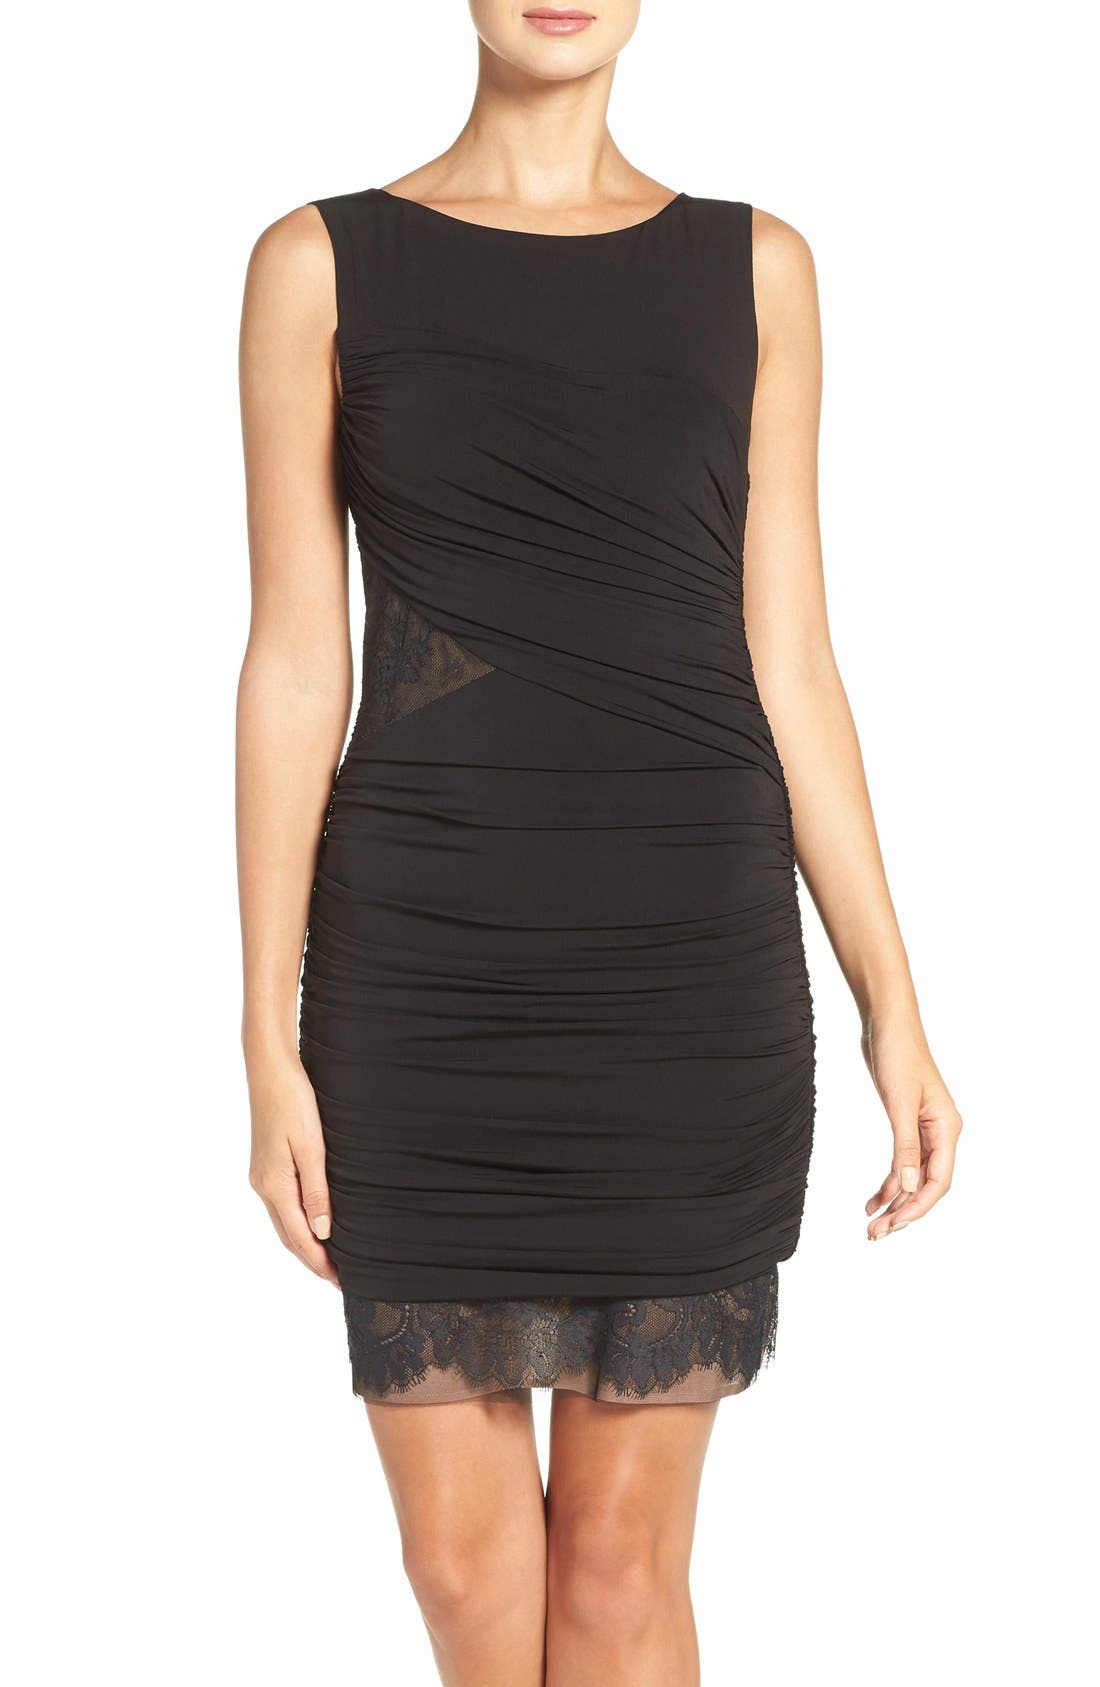 Alternate Image 1 Selected - BCBGMAXAZRIA 'Clio' Ruched Jersey Body-Con Dress